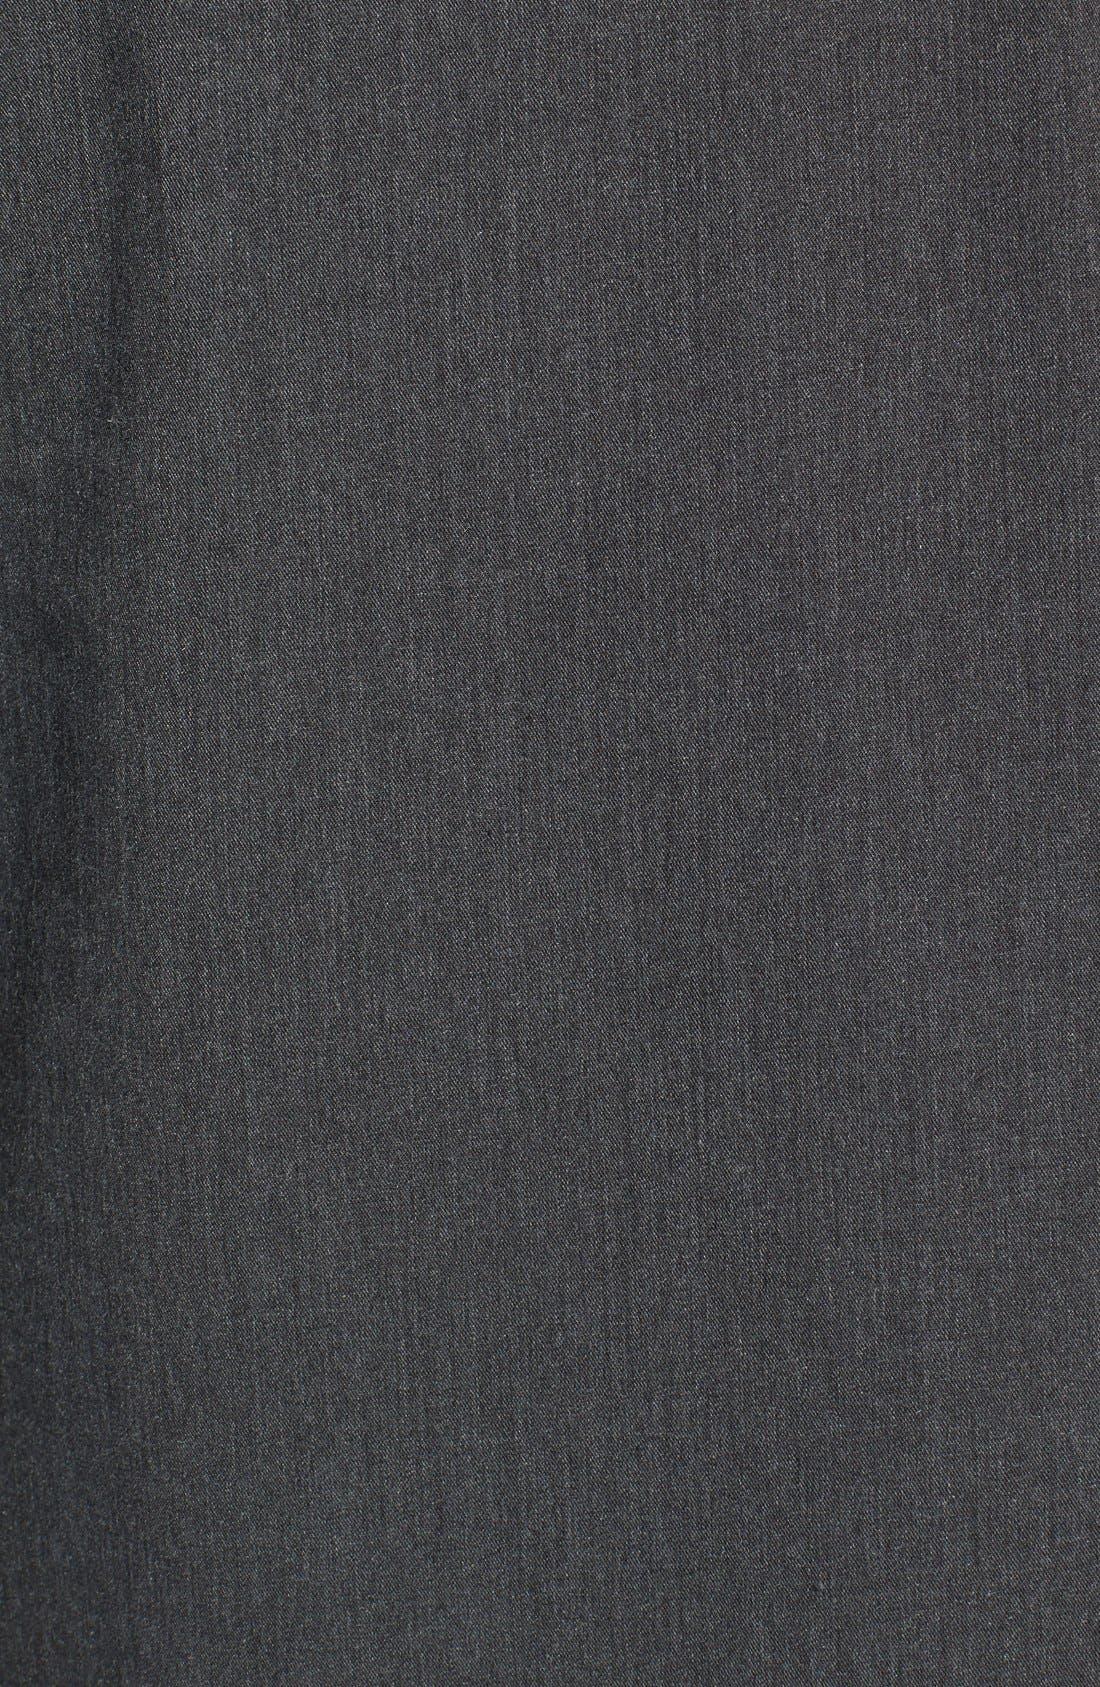 Alternate Image 3  - Nau 'Popu' Organic Cotton Blend Lace Up Coat